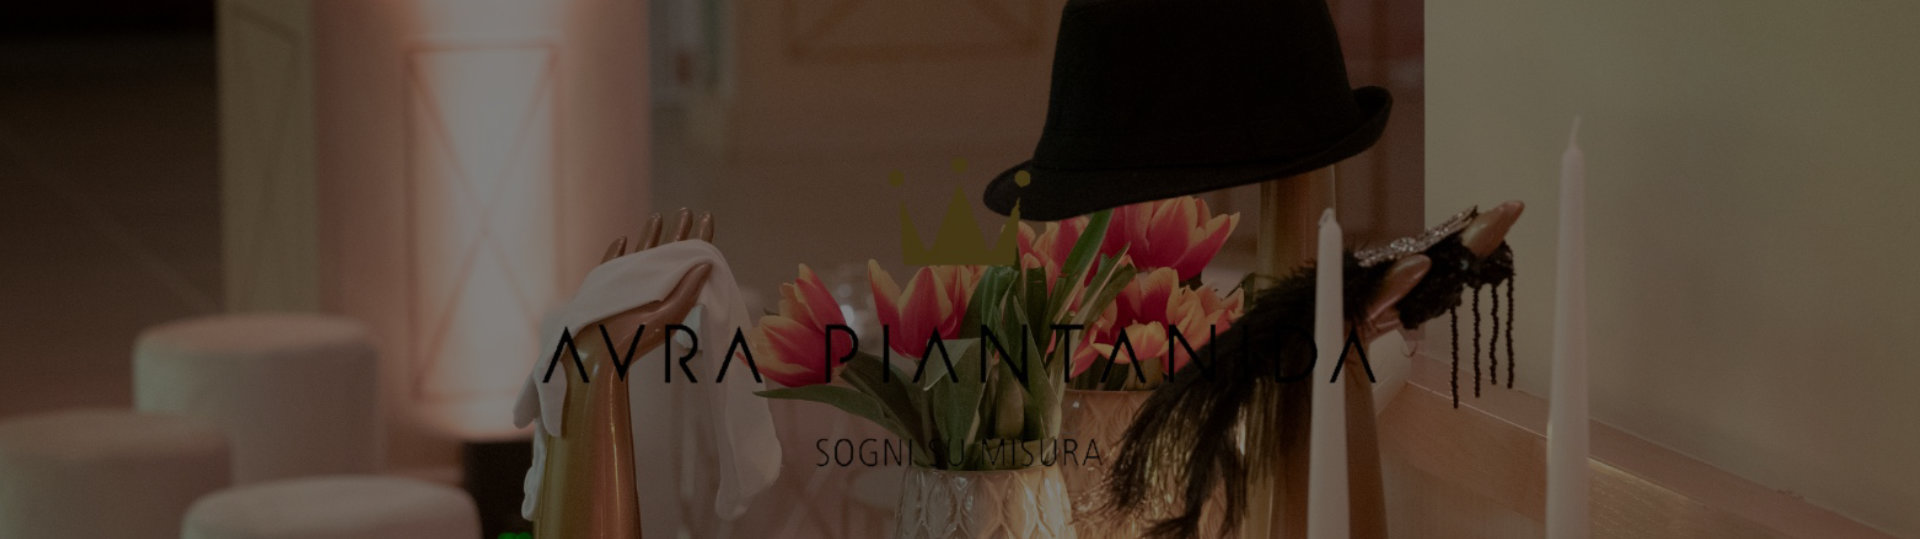 video copertina sanserverino